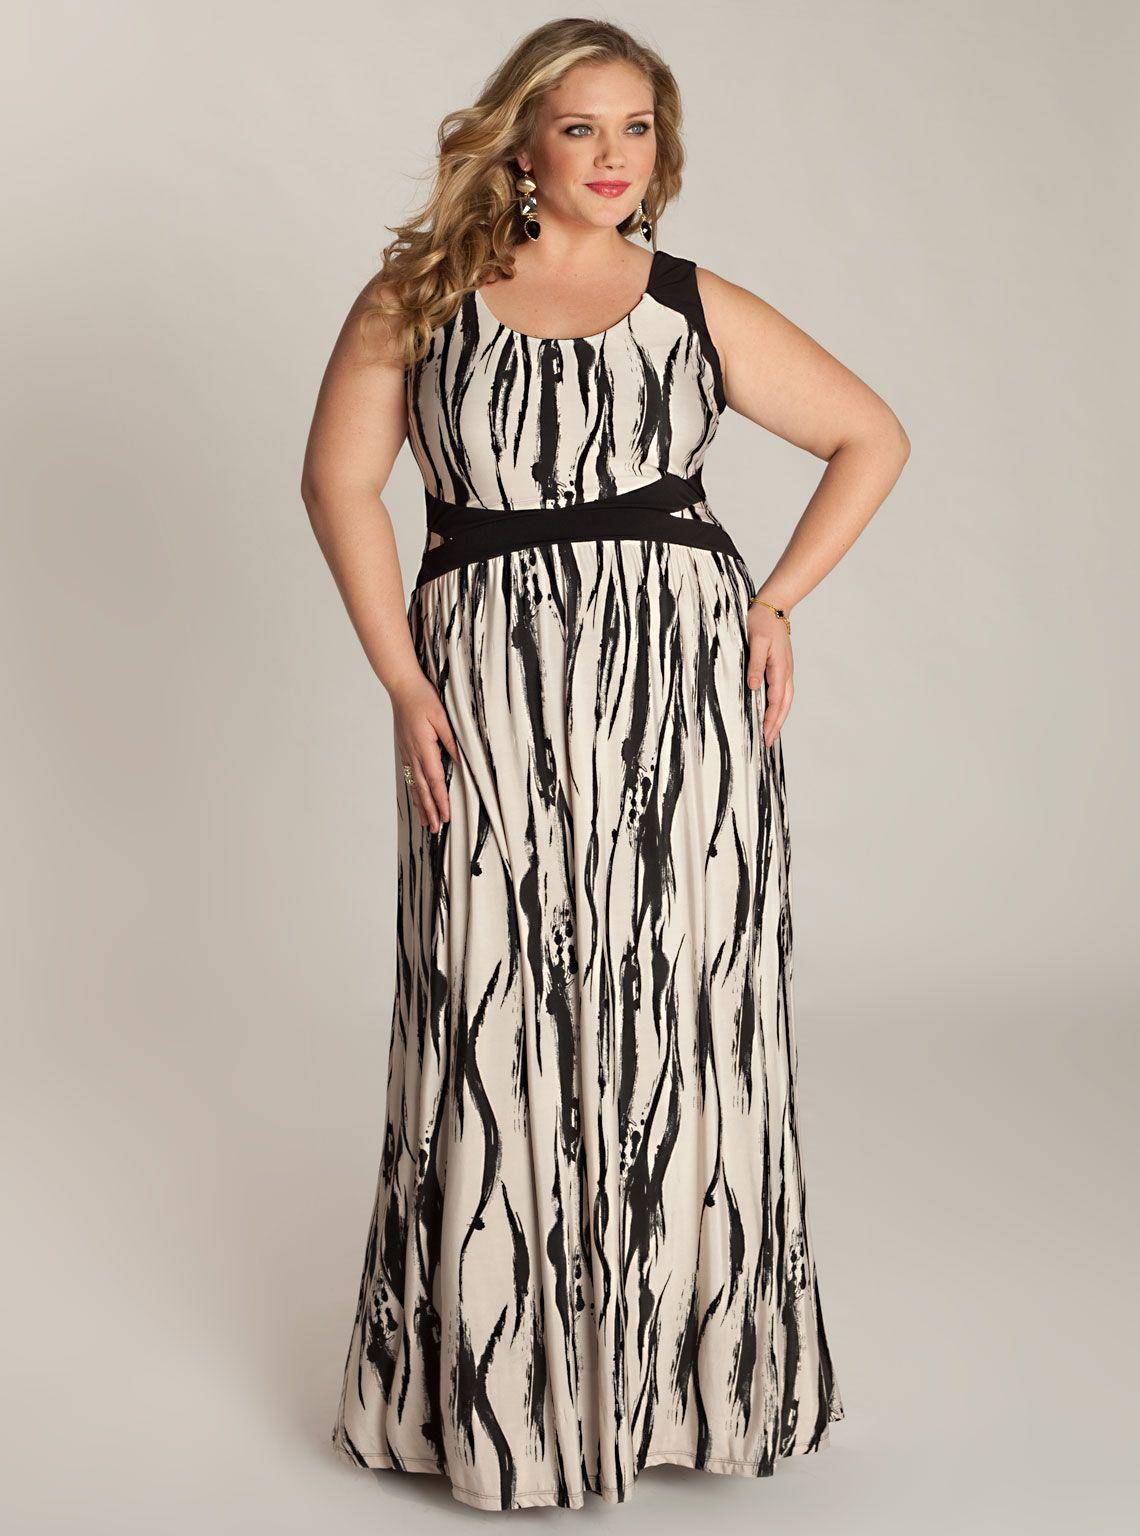 Rating dresses for dances